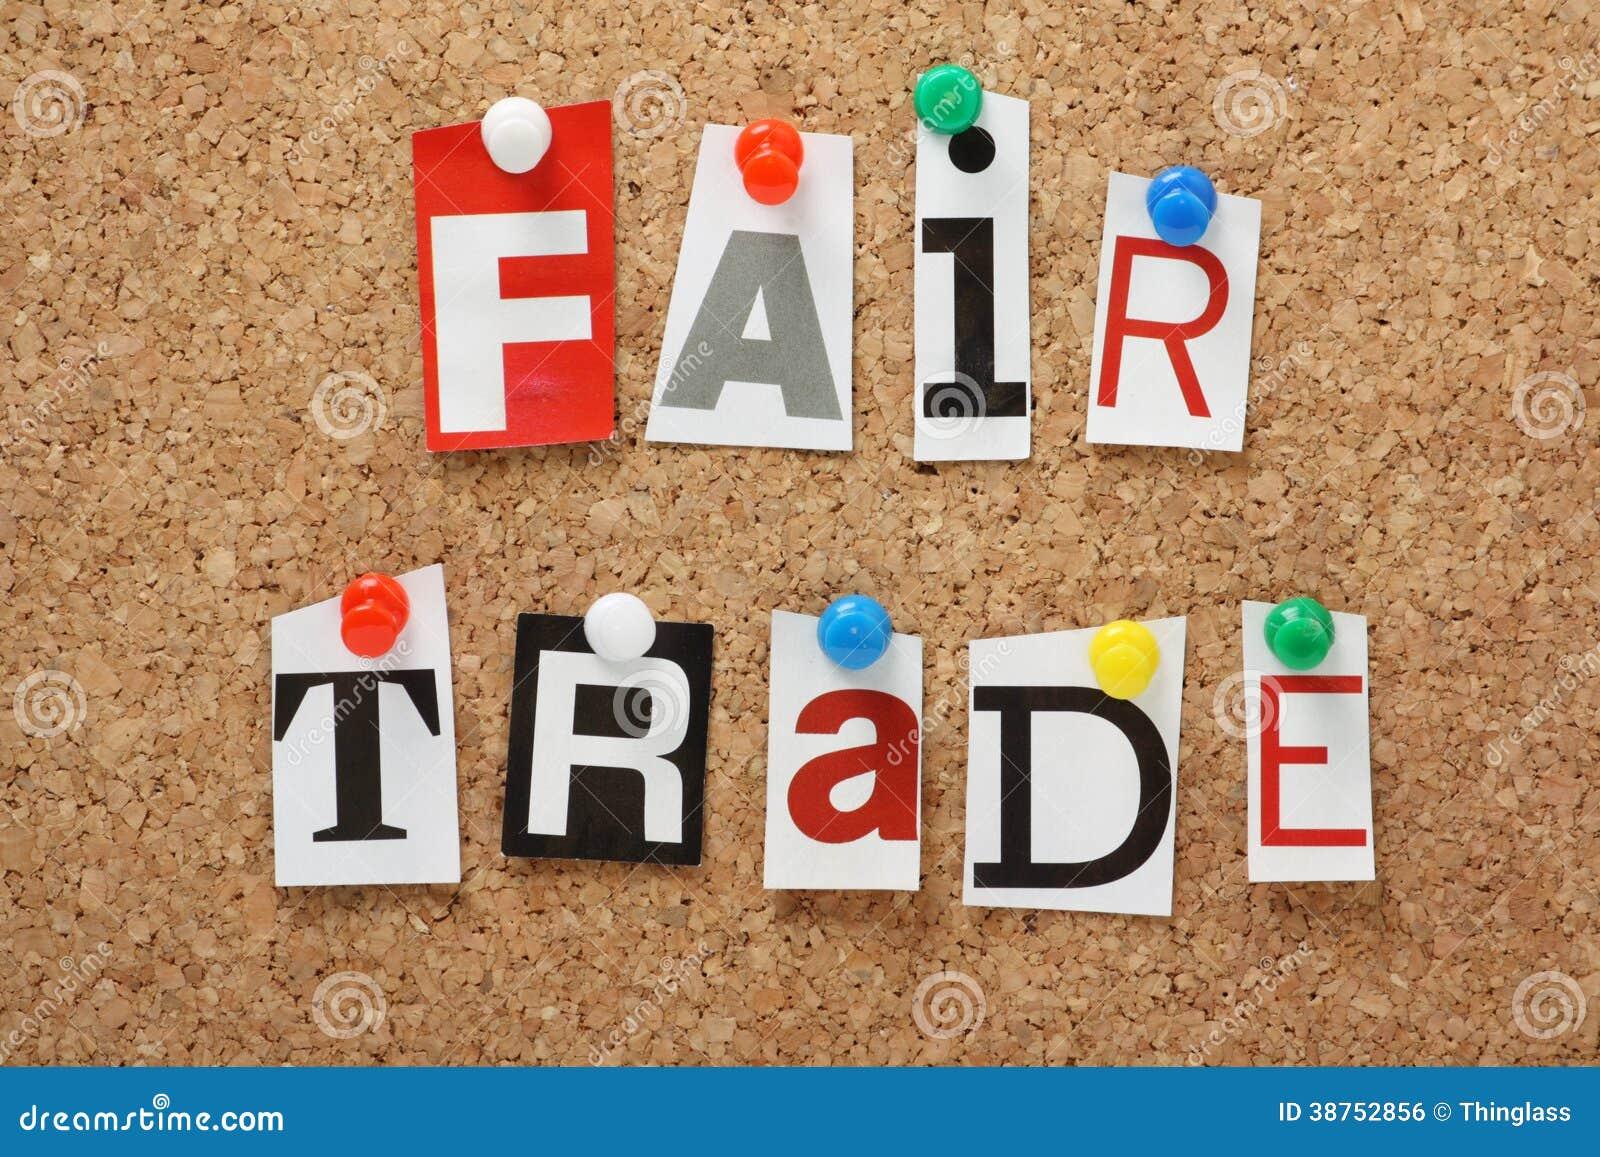 Top 10 reasons Fairtrade is Unfair